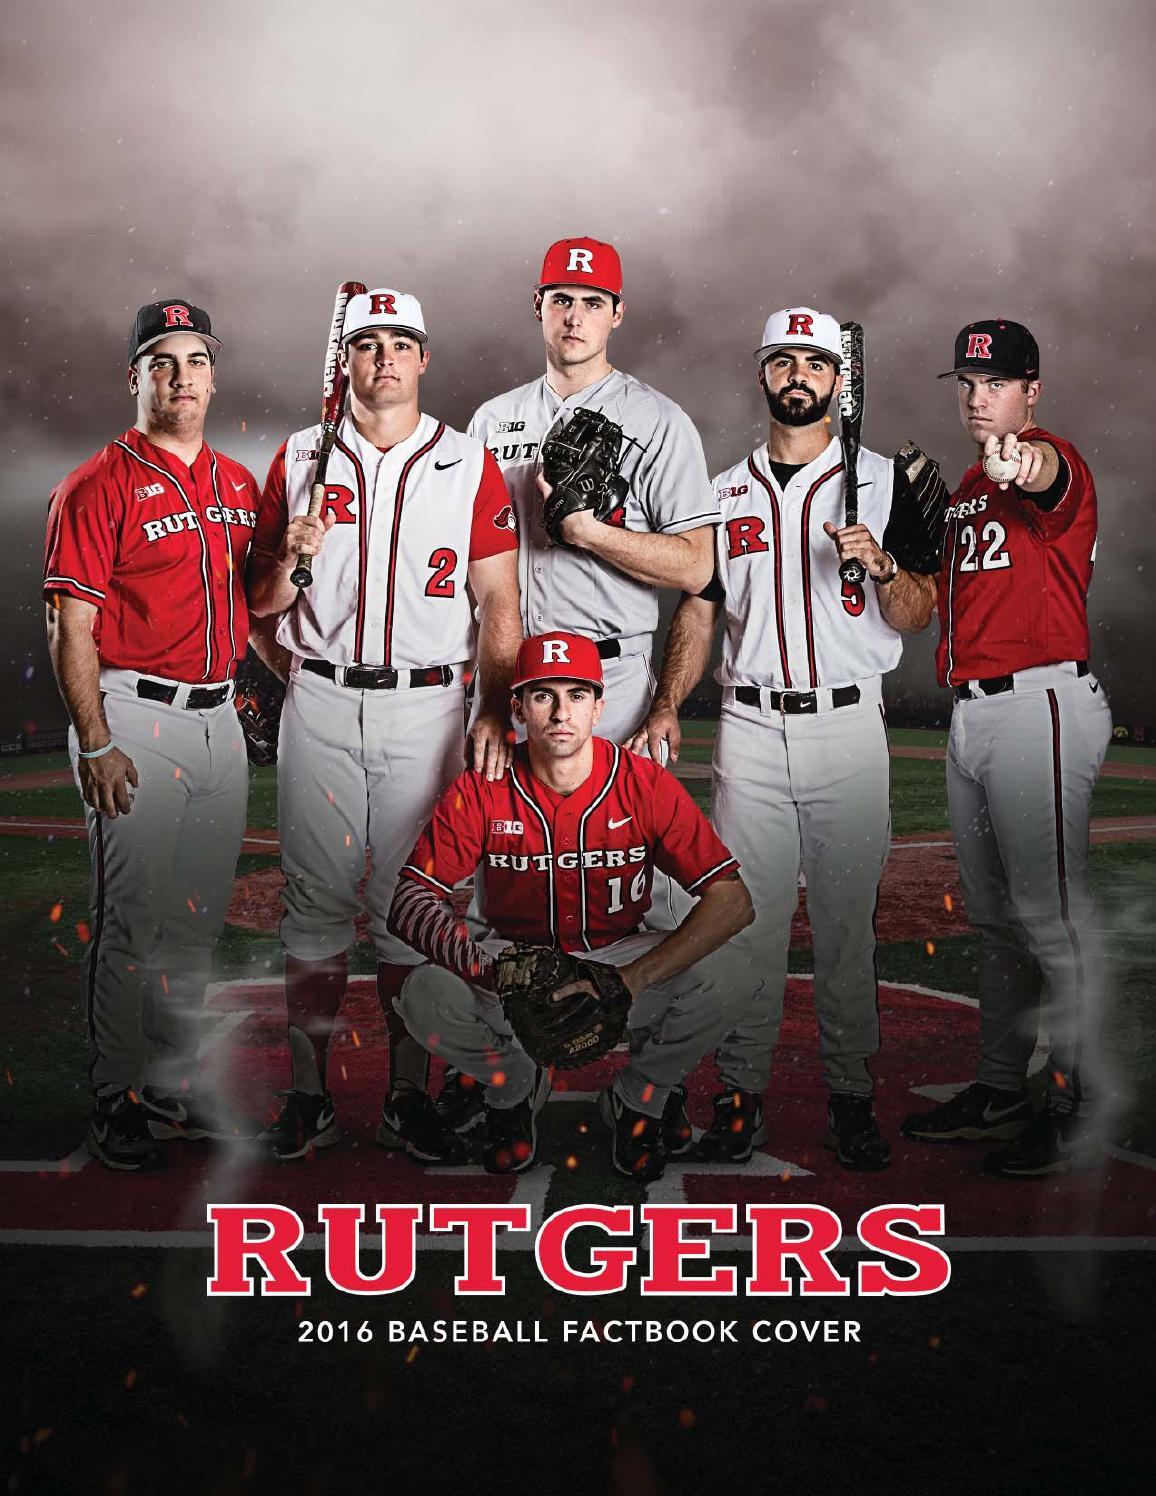 2016 Rutgers Baseball Fact Book by Rutgers Athletics - issuu